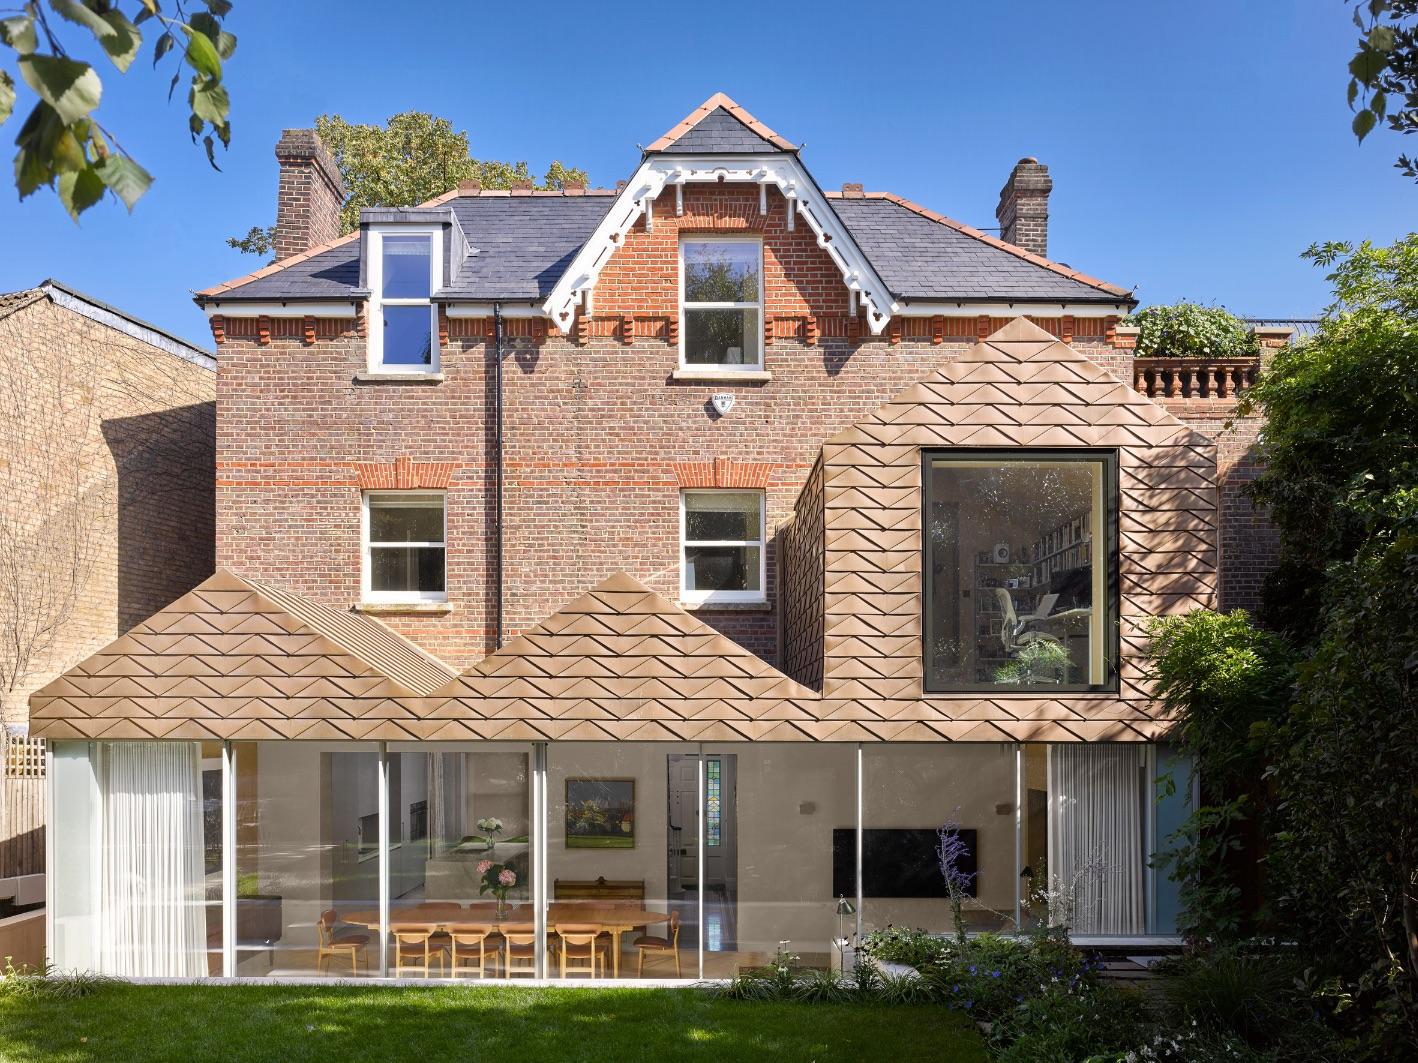 2_Dominic-McKenzie-Architects_Hampstead-House_Inspirationist